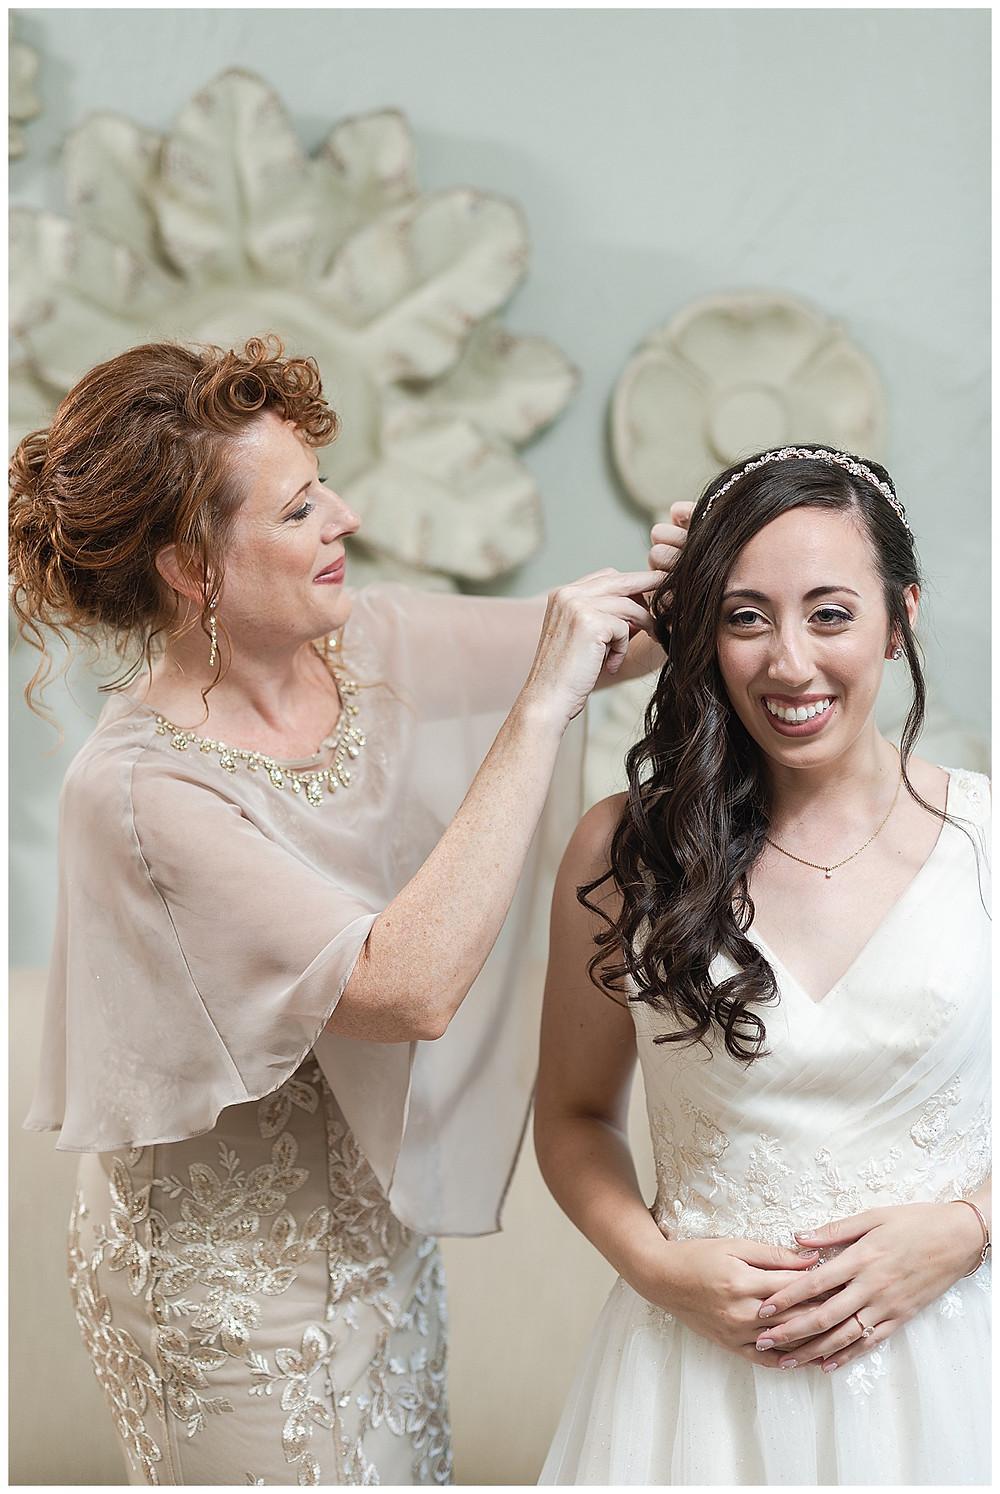 Chapel Ana Villa, The colony Texas, dallas wedding, dallas wedding photography, dallas wedding venue, brides mom putting in veil